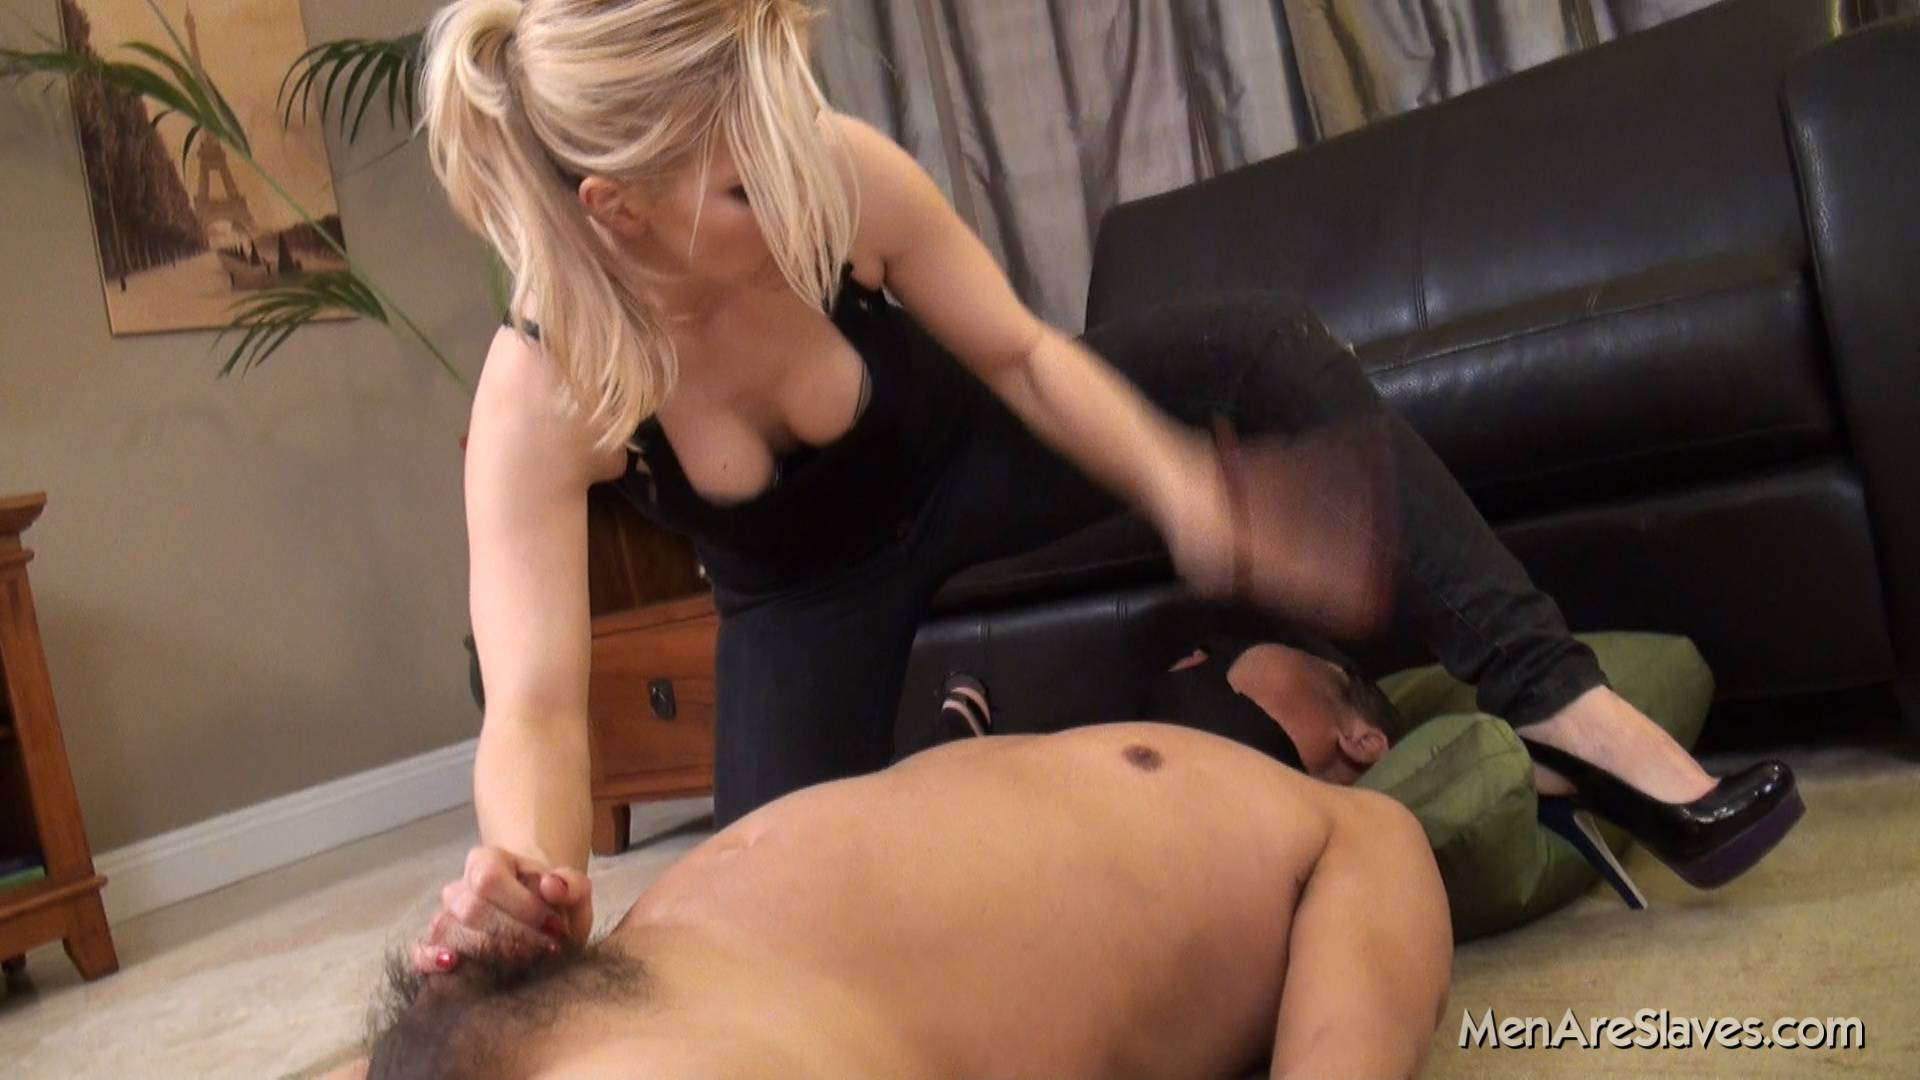 Brie Bbw Handjob And Messy Post Orgasm Stroking